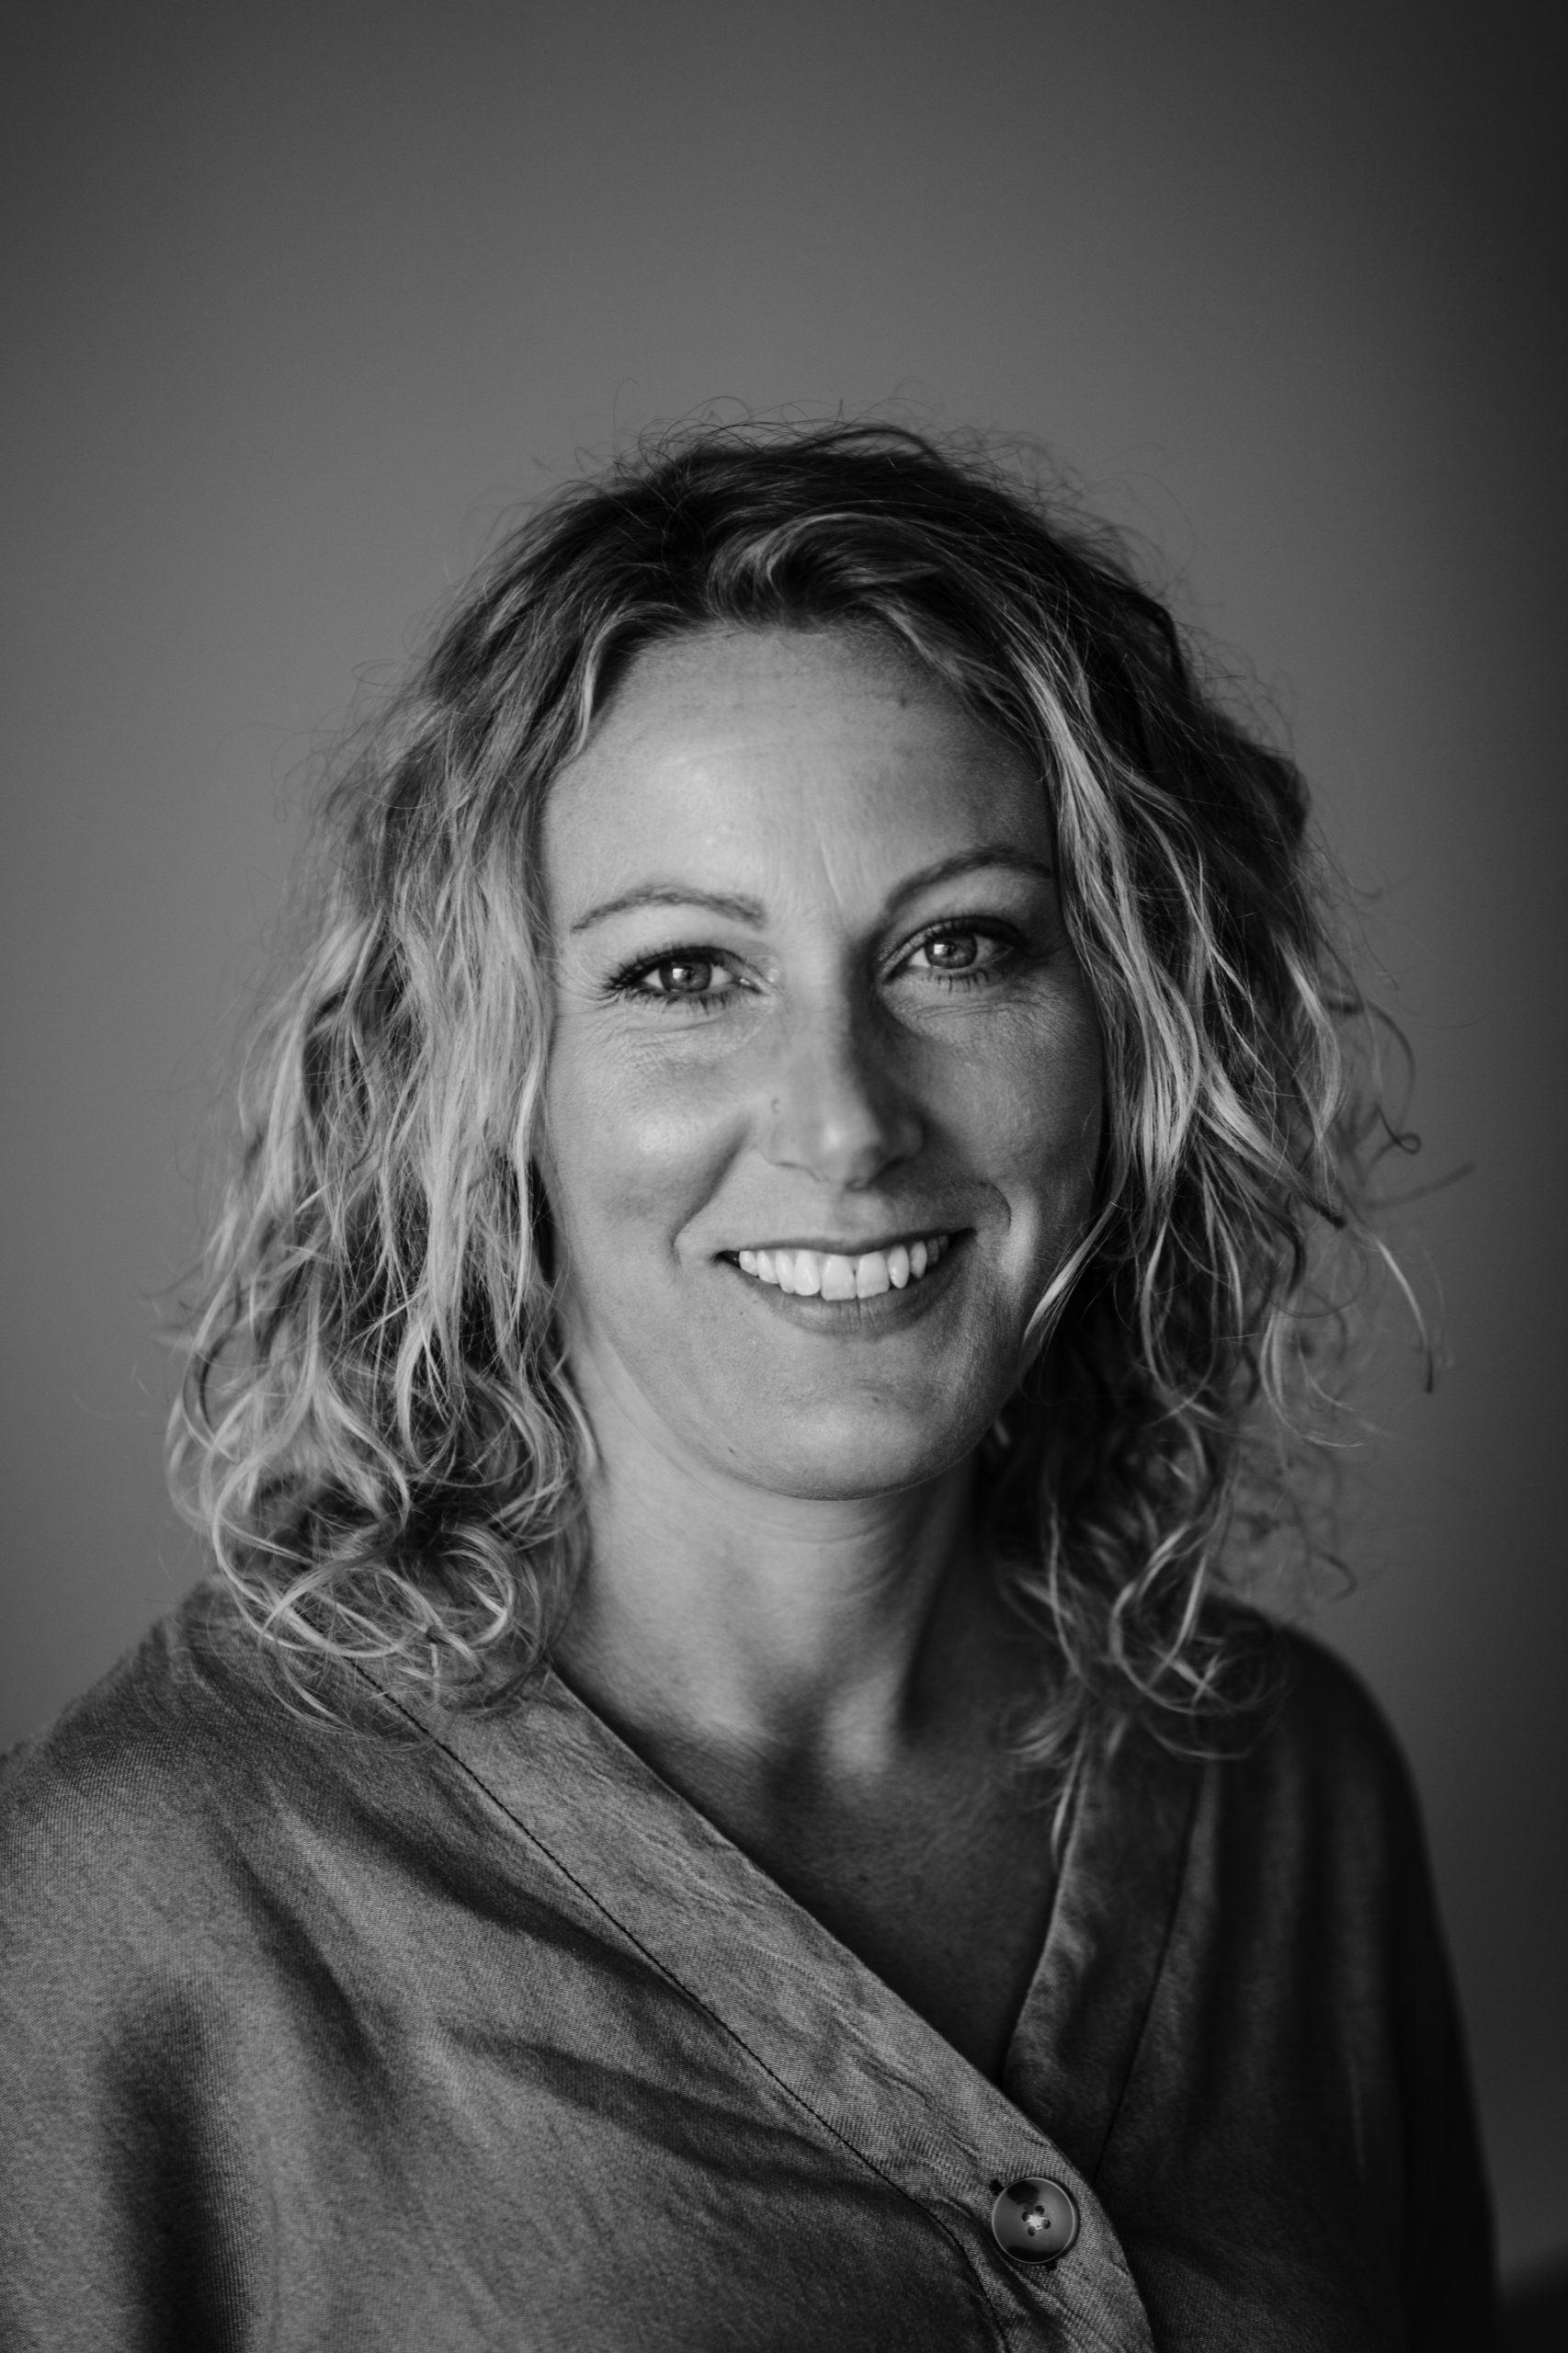 Emma Moberg